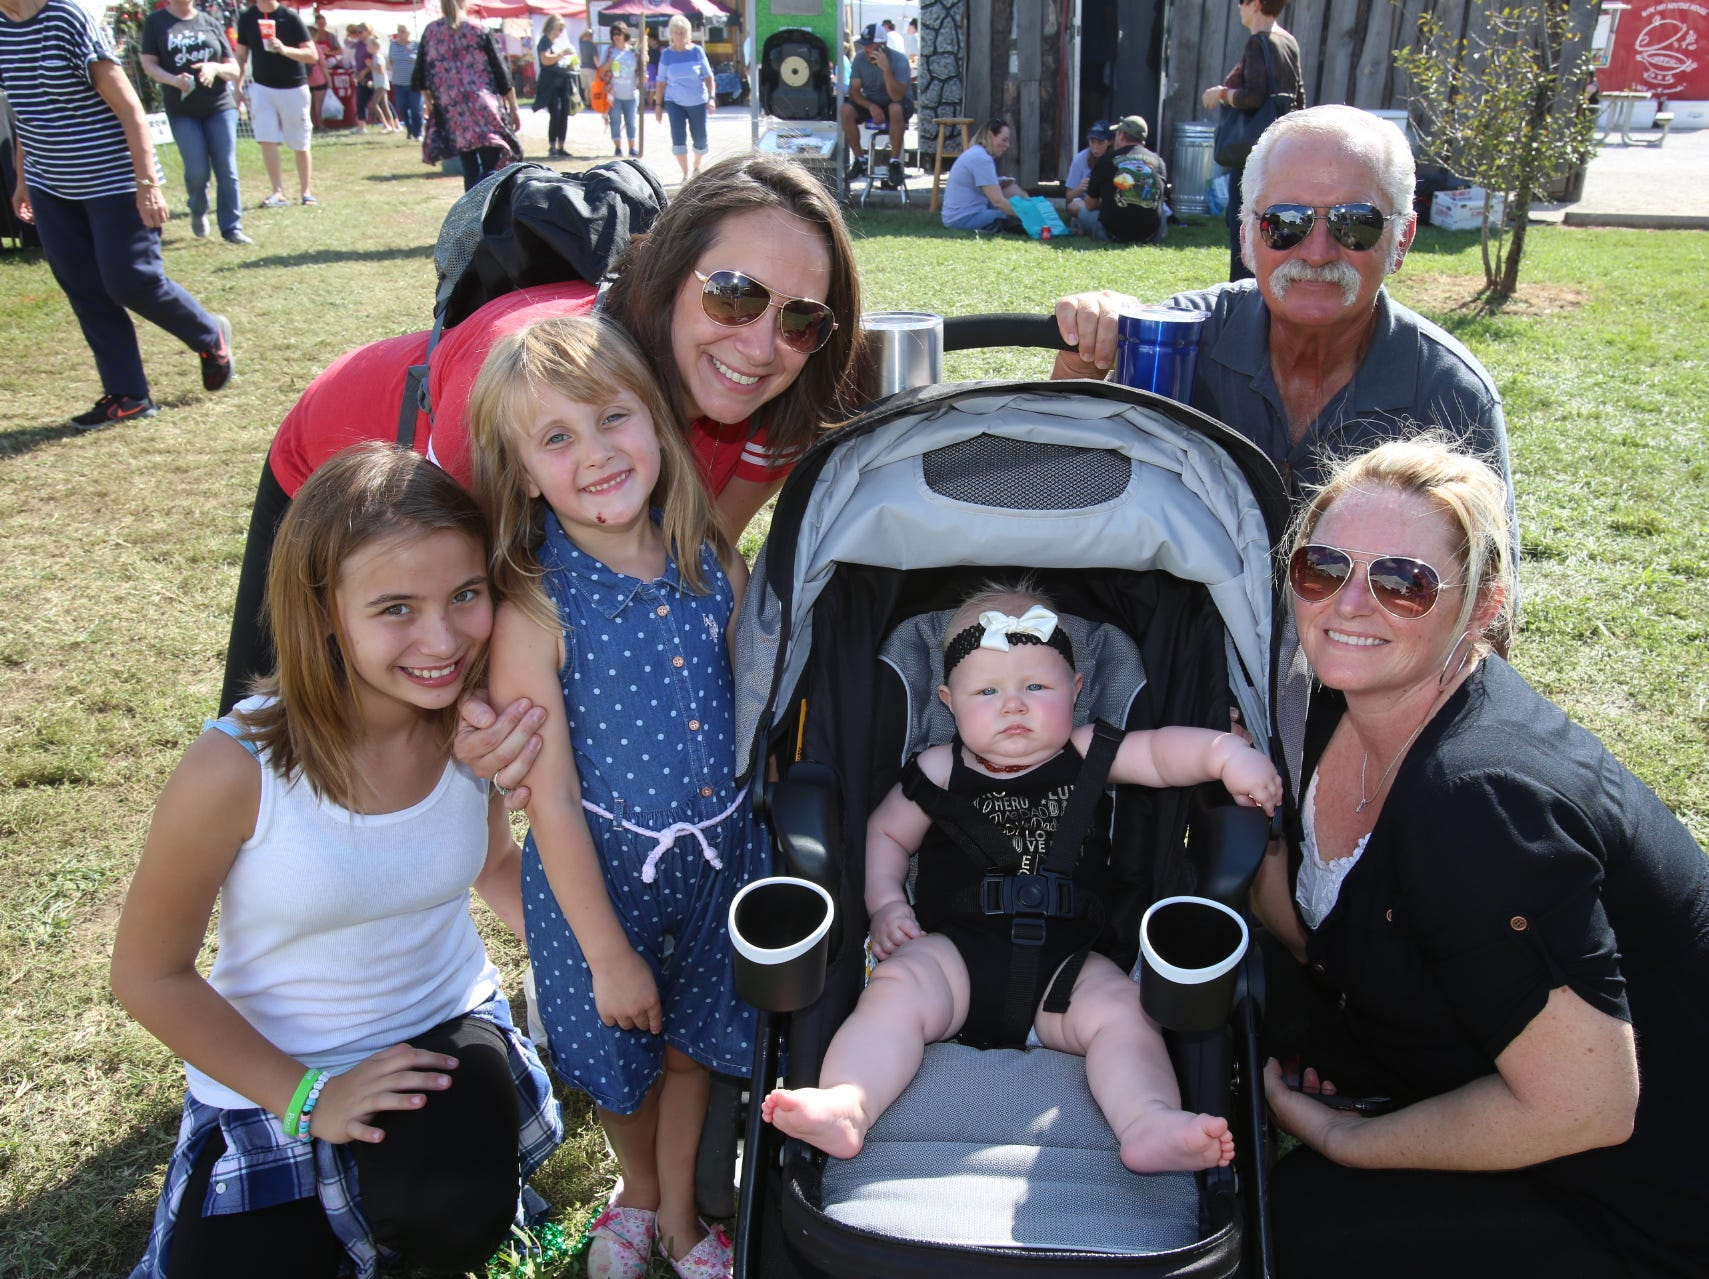 Sara, Riley, and Gracie Henderson, Cecil Keene, and Brandi and Aurora Lea